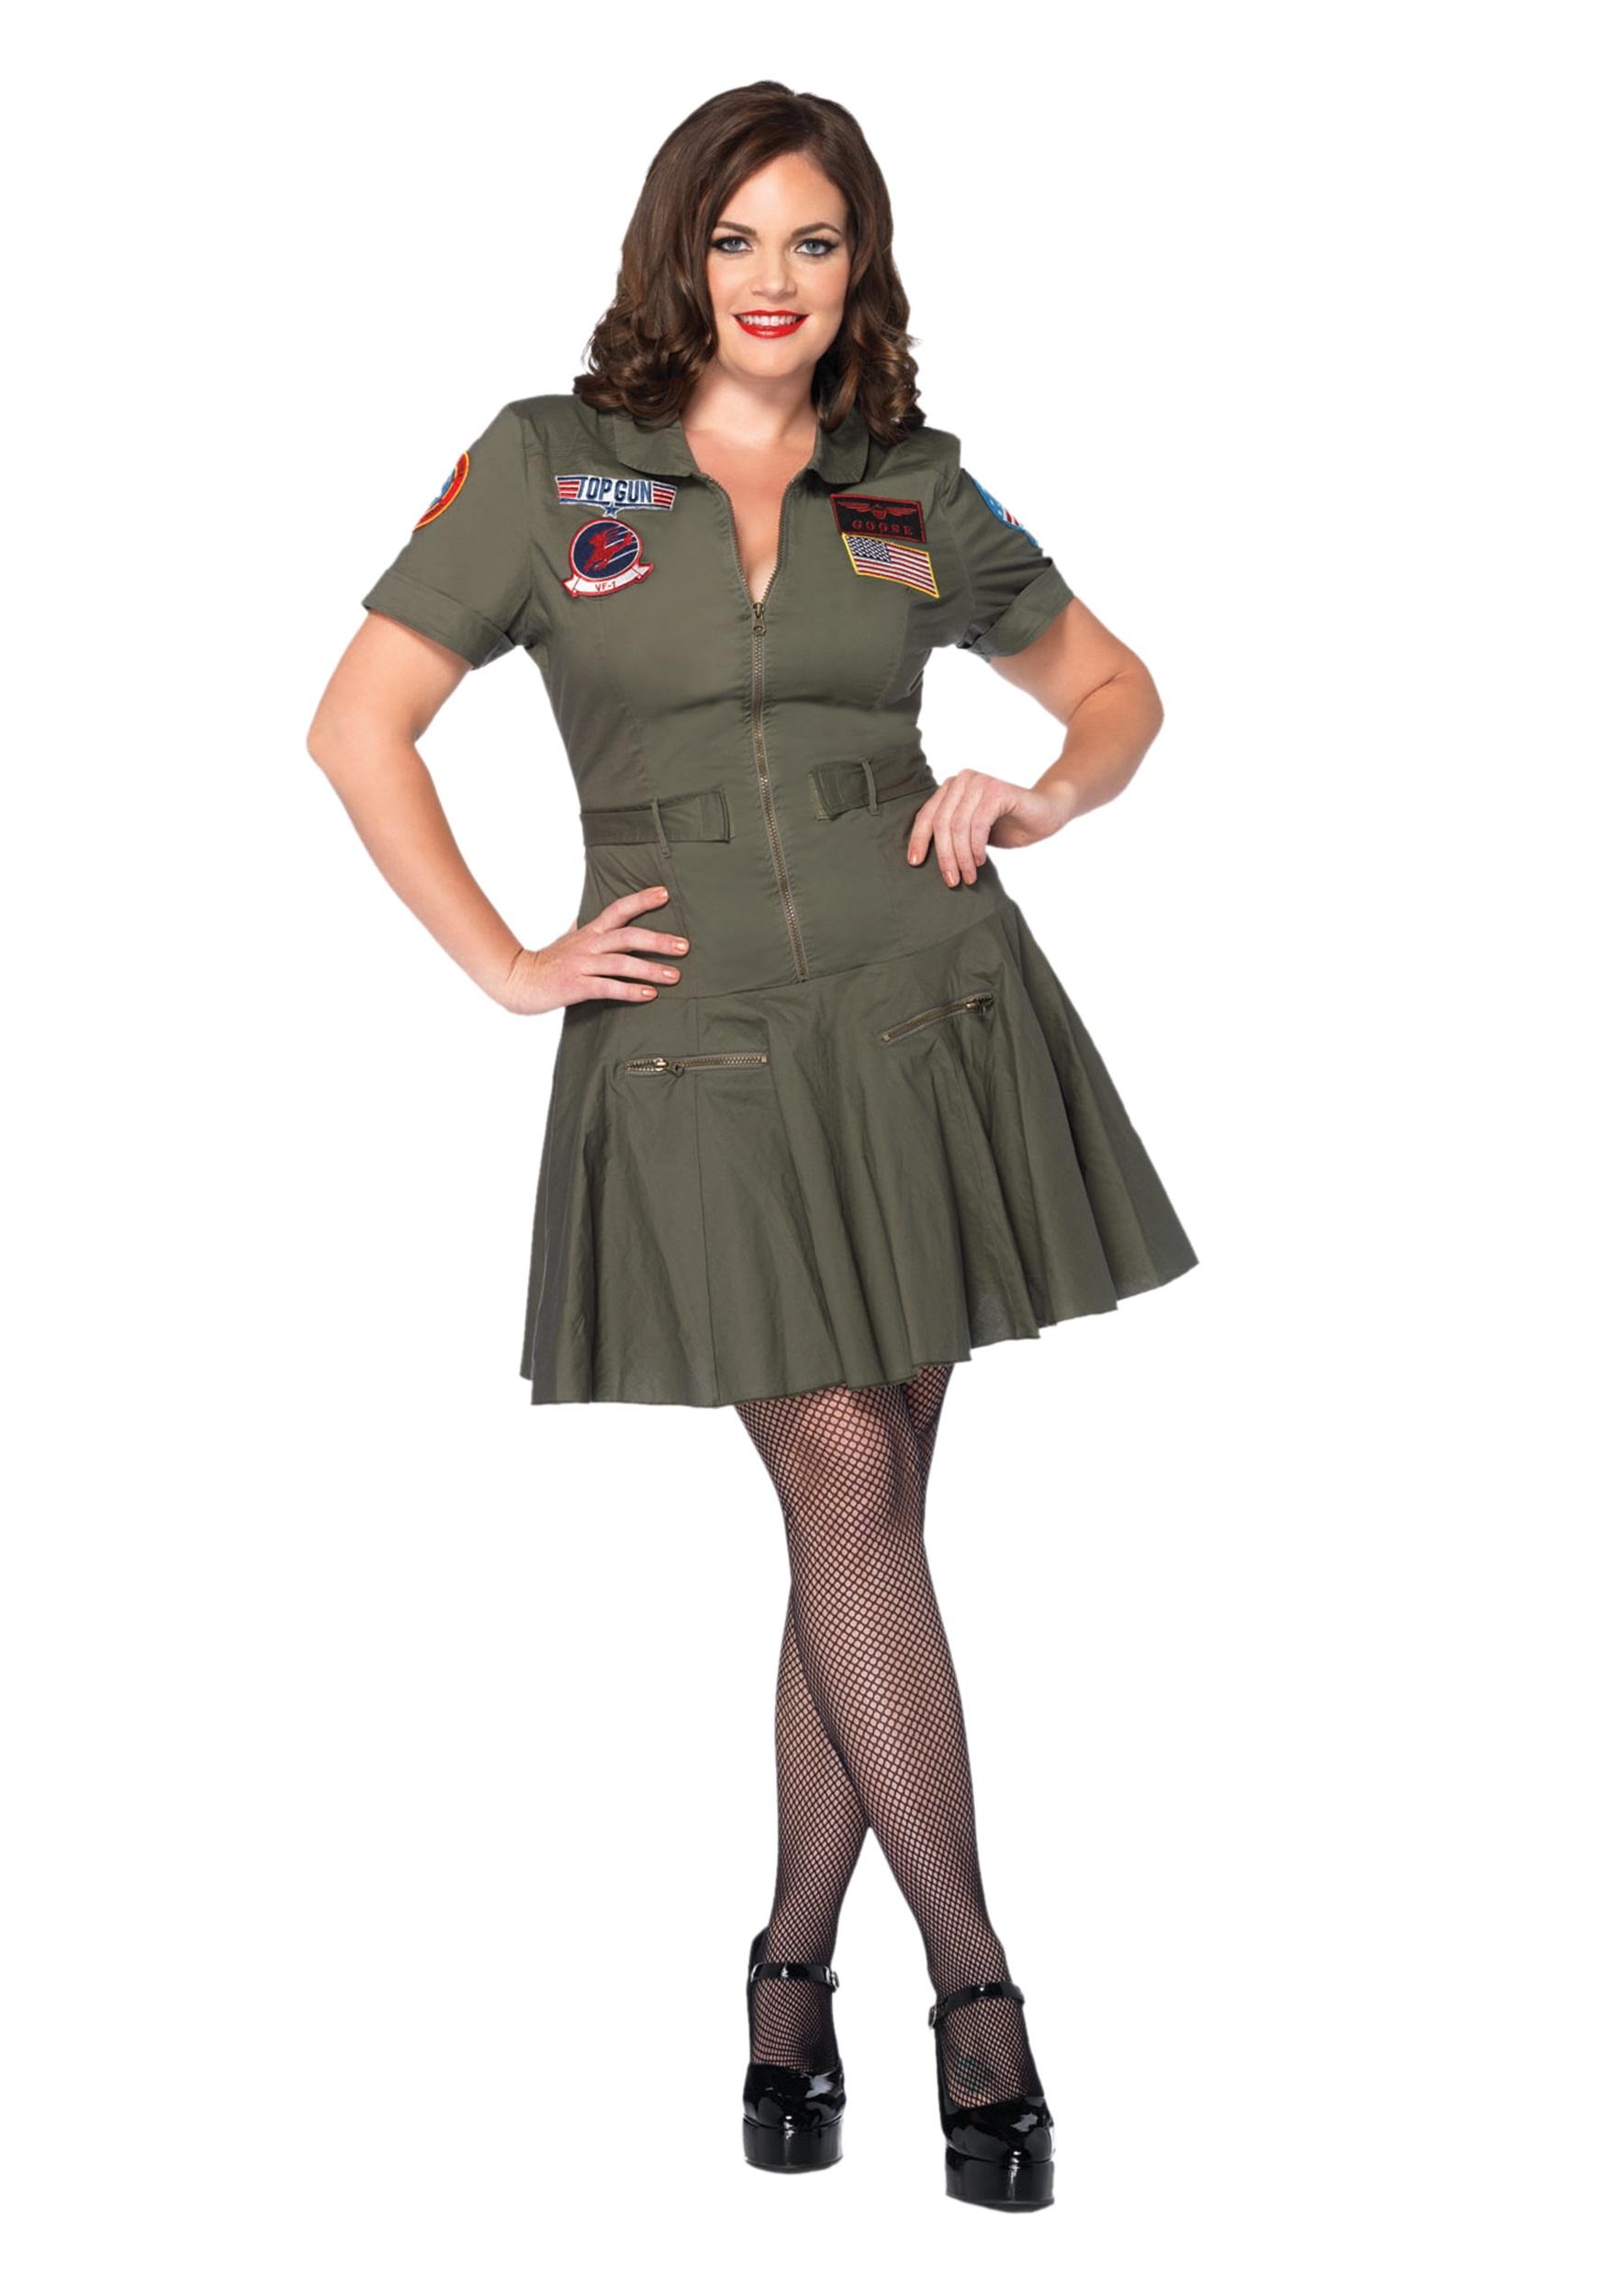 ff242ffcf0cb Top Gun Costumes   Flight Suits - HalloweenCostumes.com